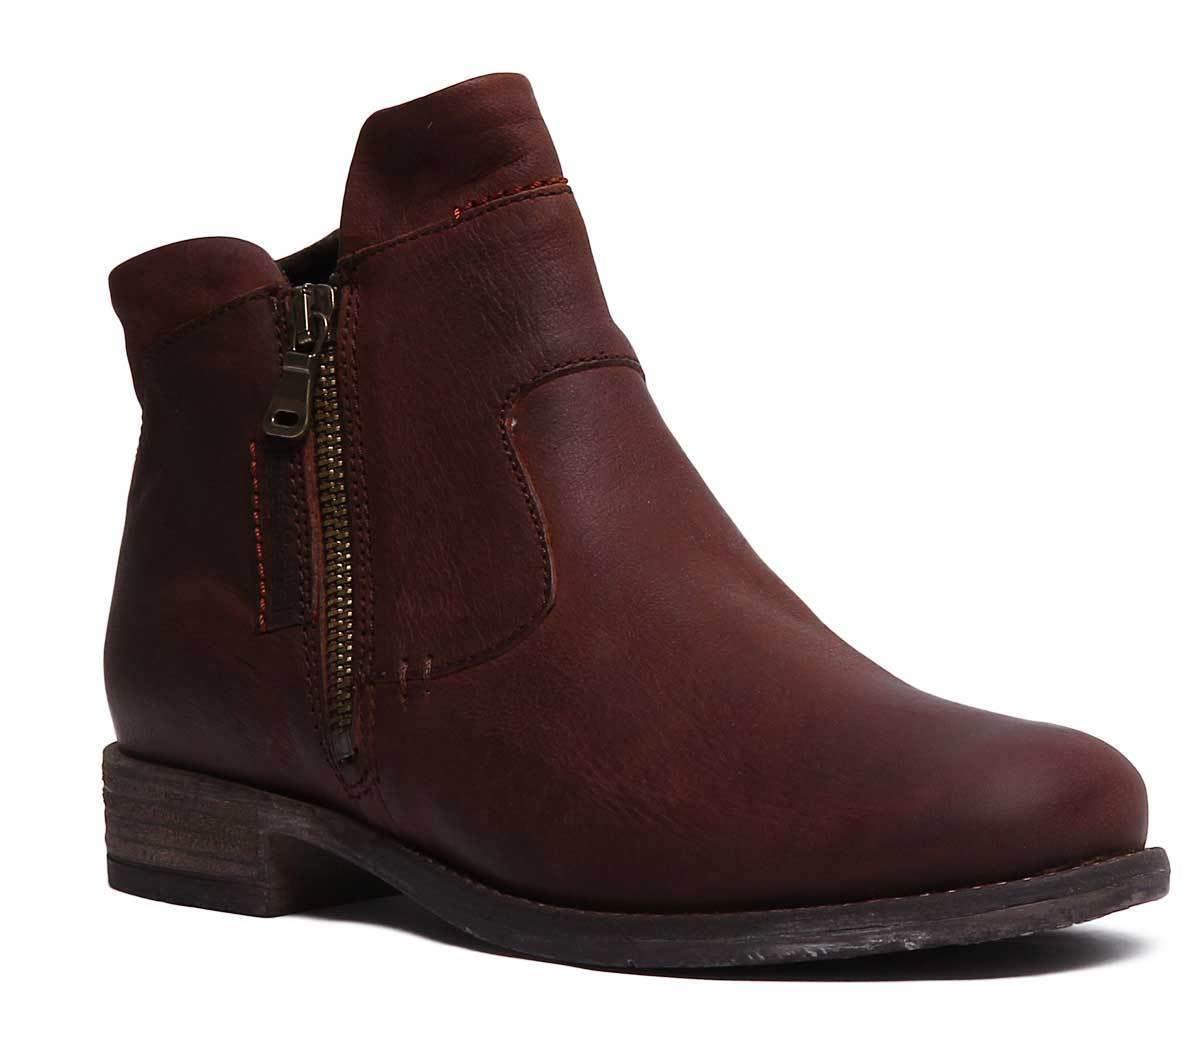 Josef Seibel Sienna 87 donna Leather Matt Camel  Ankle stivali UK Dimensione 3 - 8  presa di marca